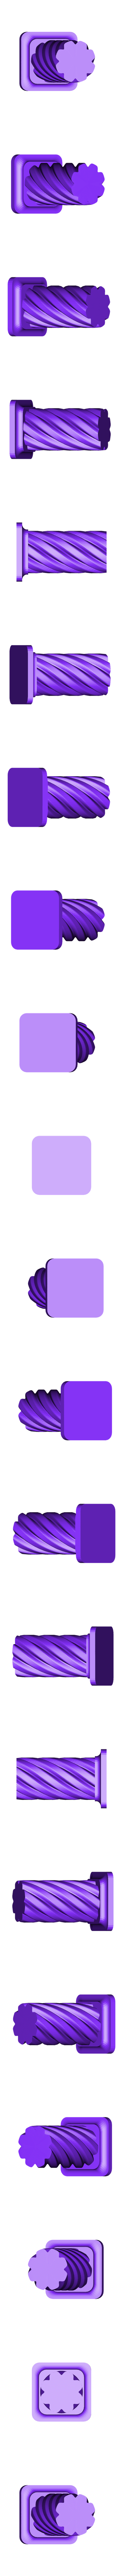 Pillar_Complete.stl Download free STL file Spiral Pillar • 3D printable model, daandruff